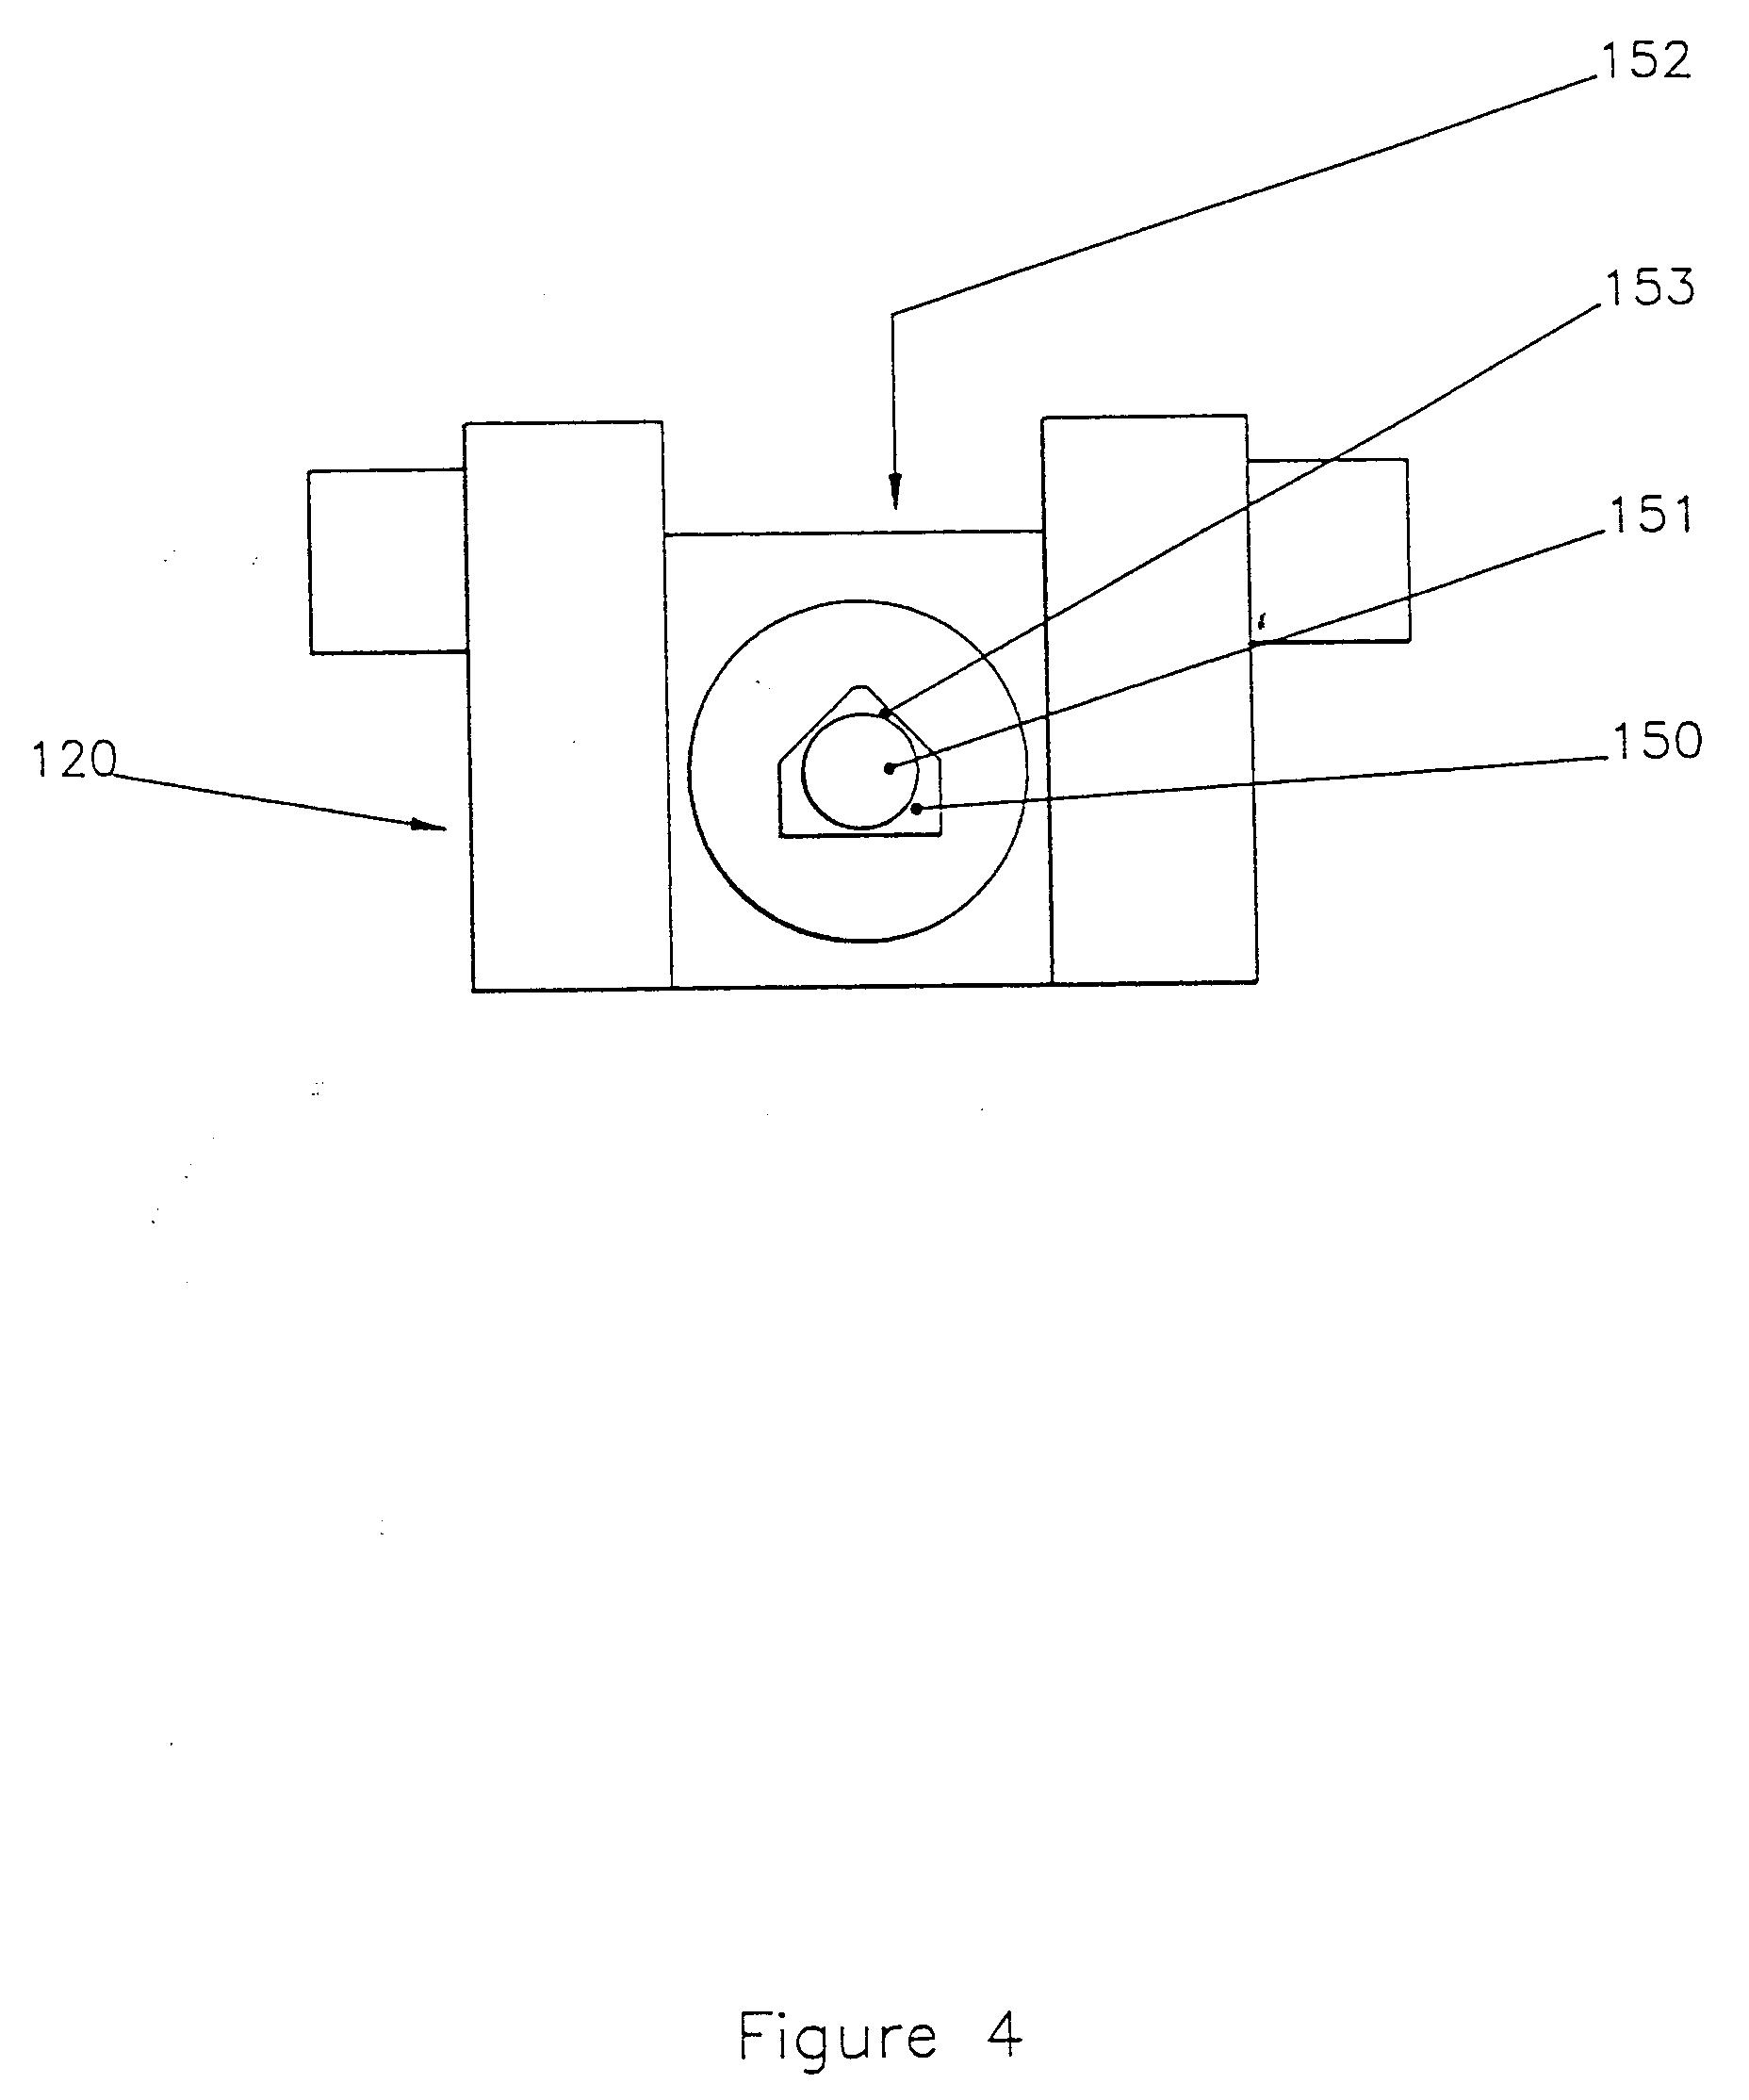 专利ep0551181b1 - underpinning